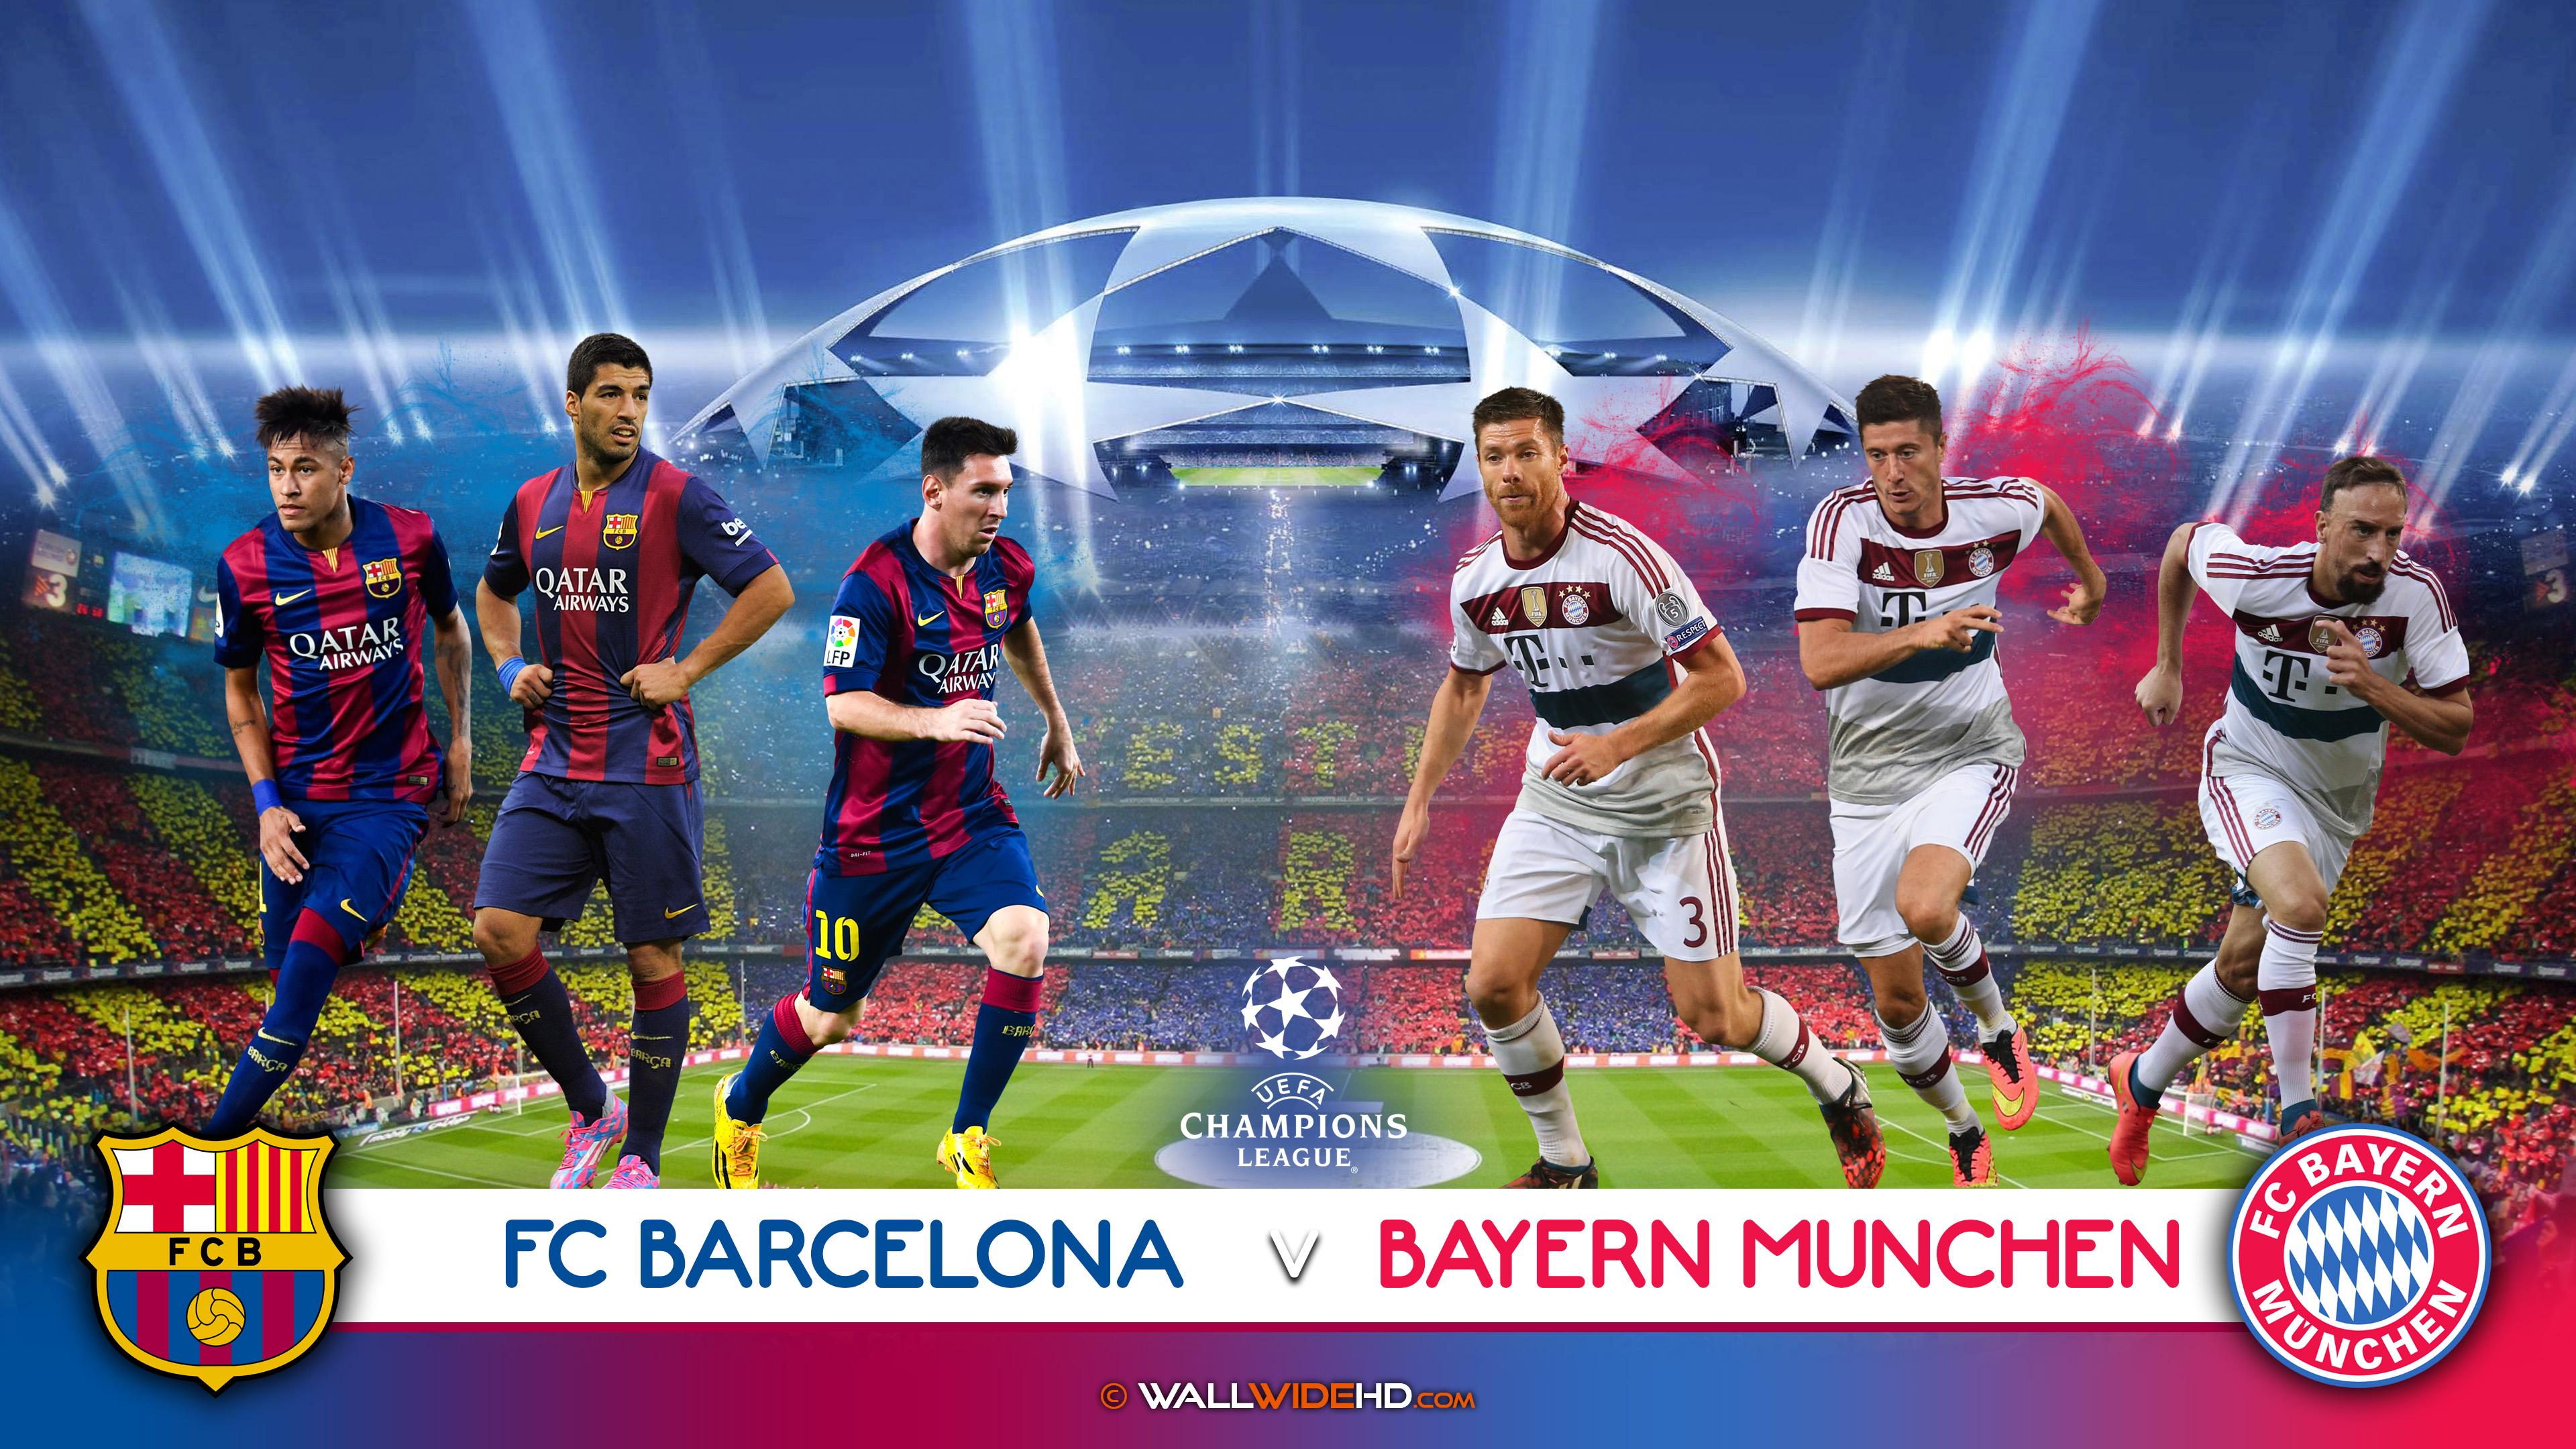 Free Download Fc Barcelona Vs Bayern Munchen 5th May 2015 Uefa Champions League 4k 3840x2160 For Your Desktop Mobile Tablet Explore 38 Fc Barcelona Champions League Wallpaper Fc Barcelona